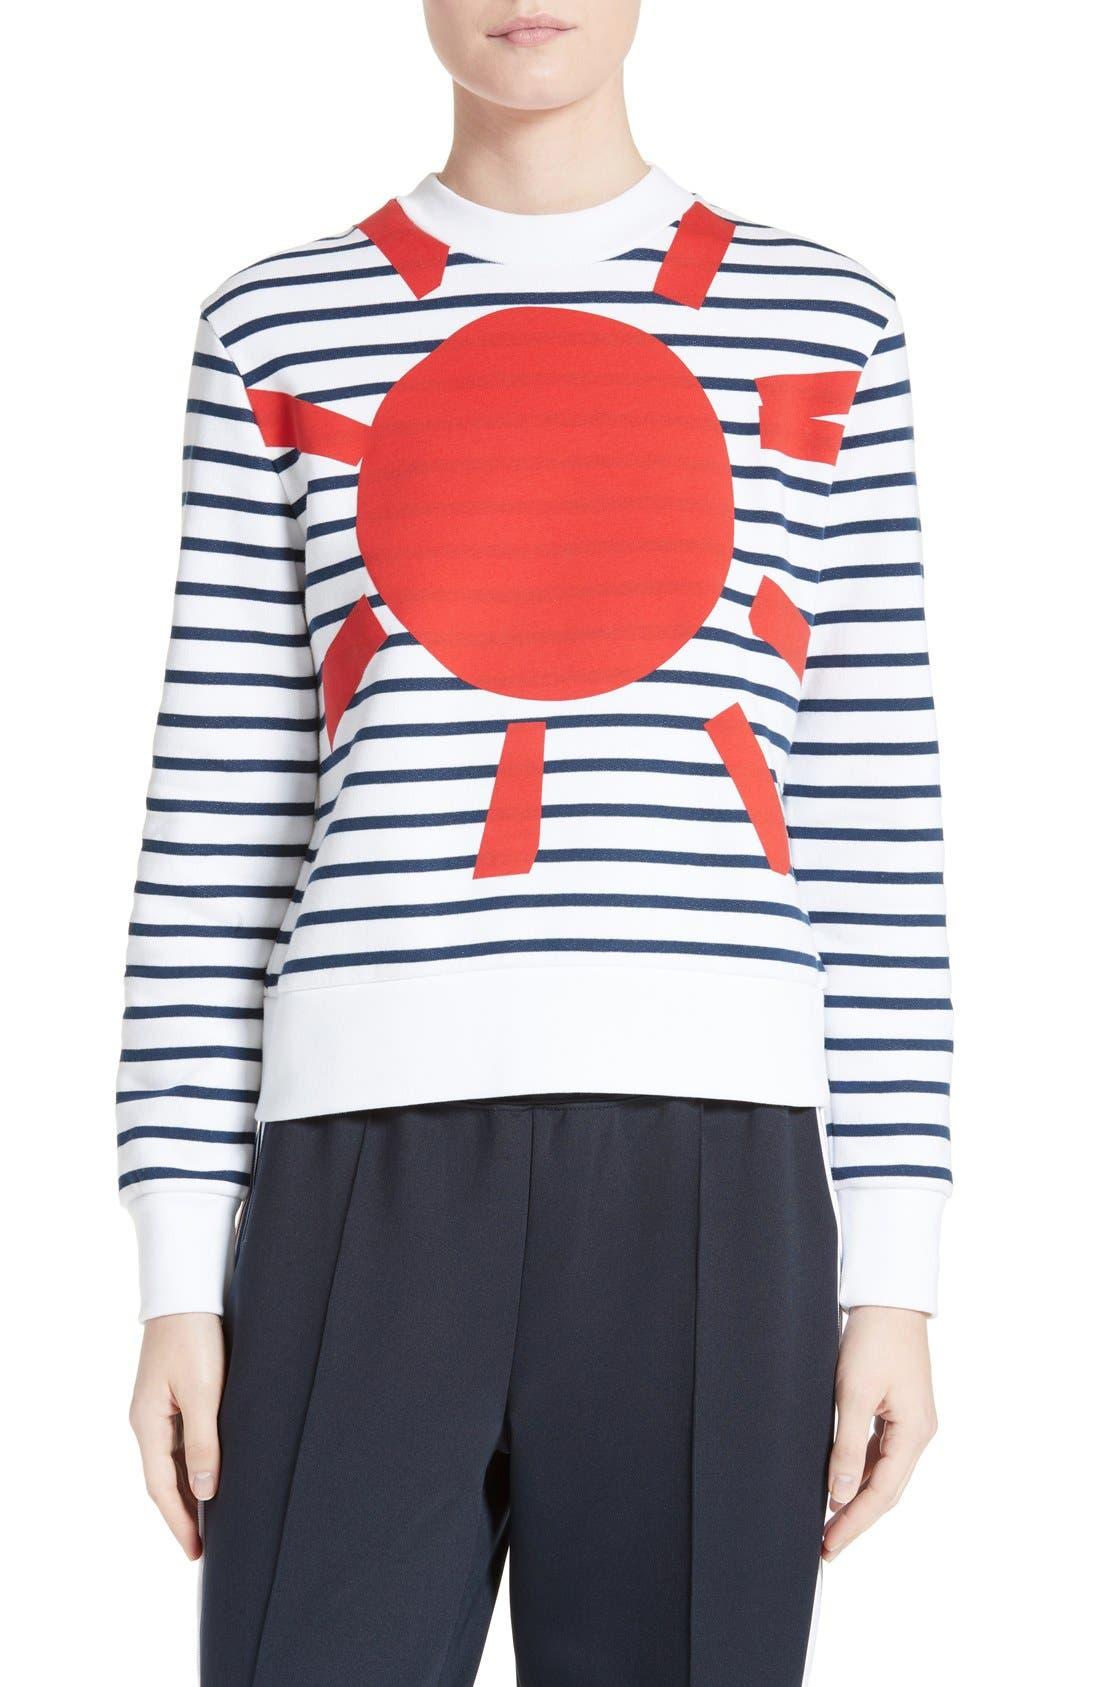 Alternate Image 1 Selected - être cécile Sunny Side Up Stripe Graphic Sweatshirt